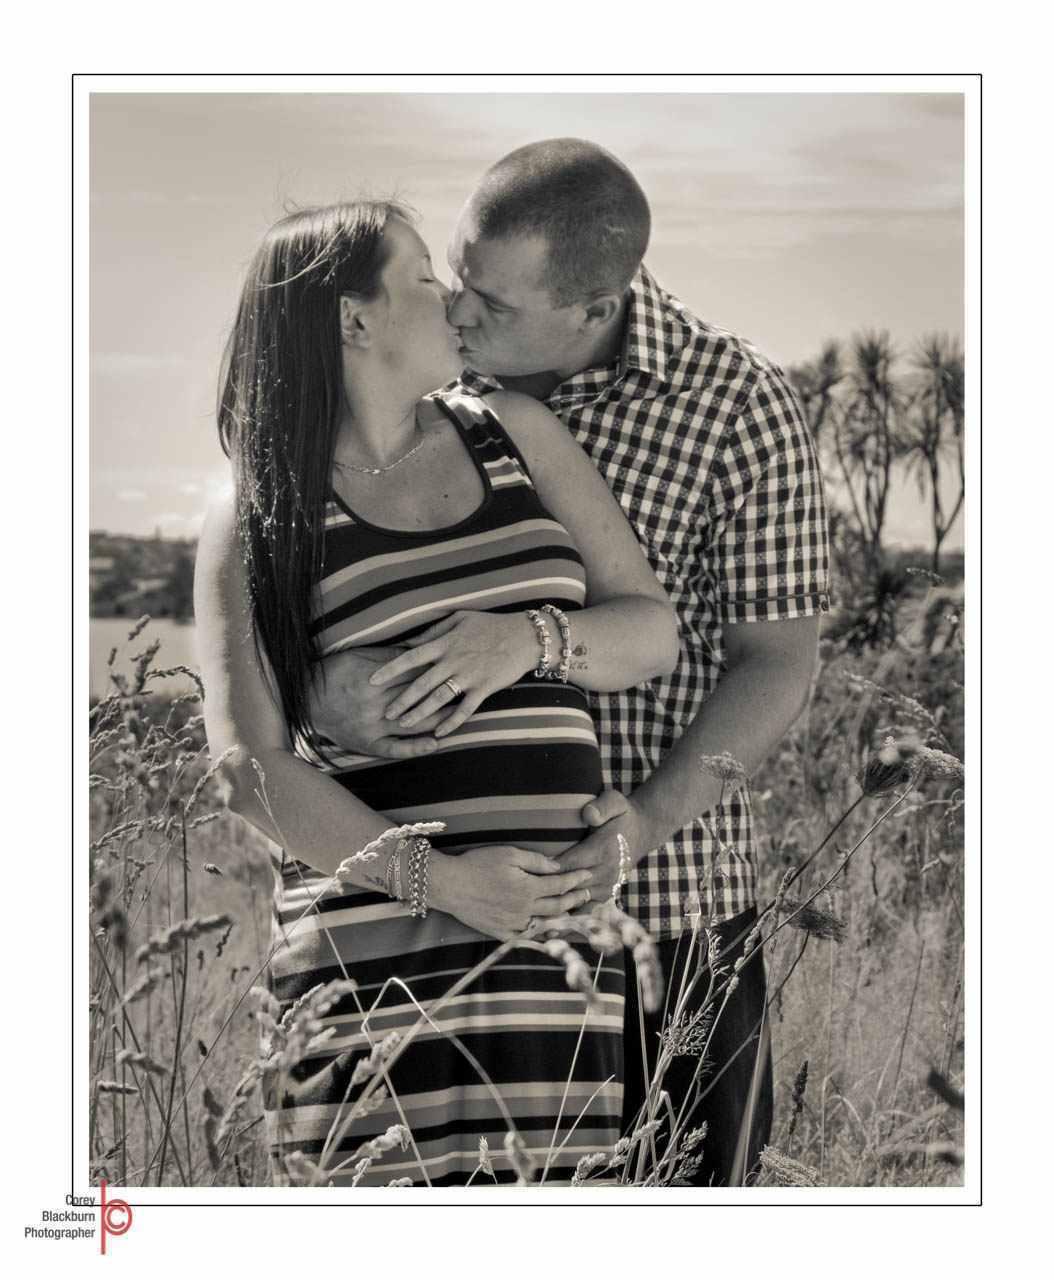 Pregnancy 15 - Corey Blackburn Photographer - Weddings | Pregnancy | Newborn | Portrait | Fine Art | Commercial | Journalism